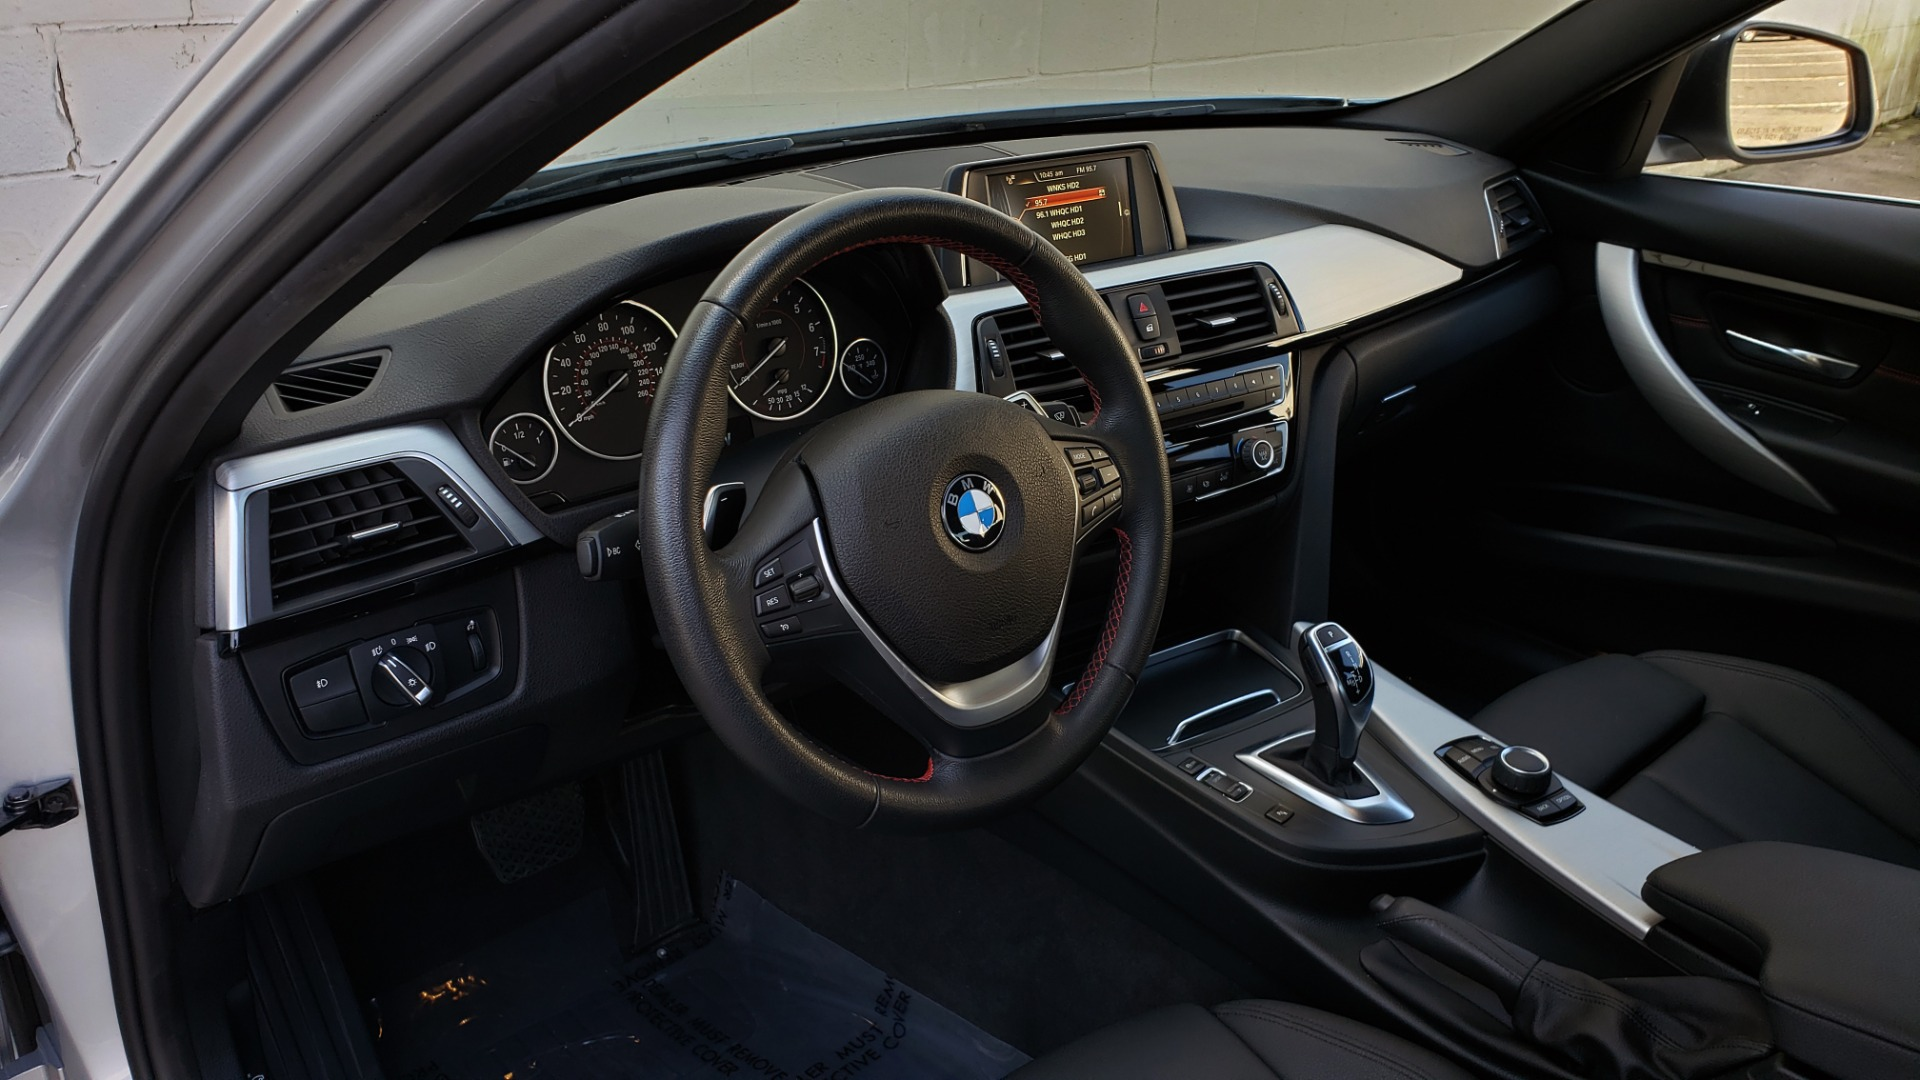 Used 2017 BMW 3 SERIES 330I SPORT SEDAN / DRVR ASST PKG / SUNROOF / REARVIEW for sale Sold at Formula Imports in Charlotte NC 28227 36